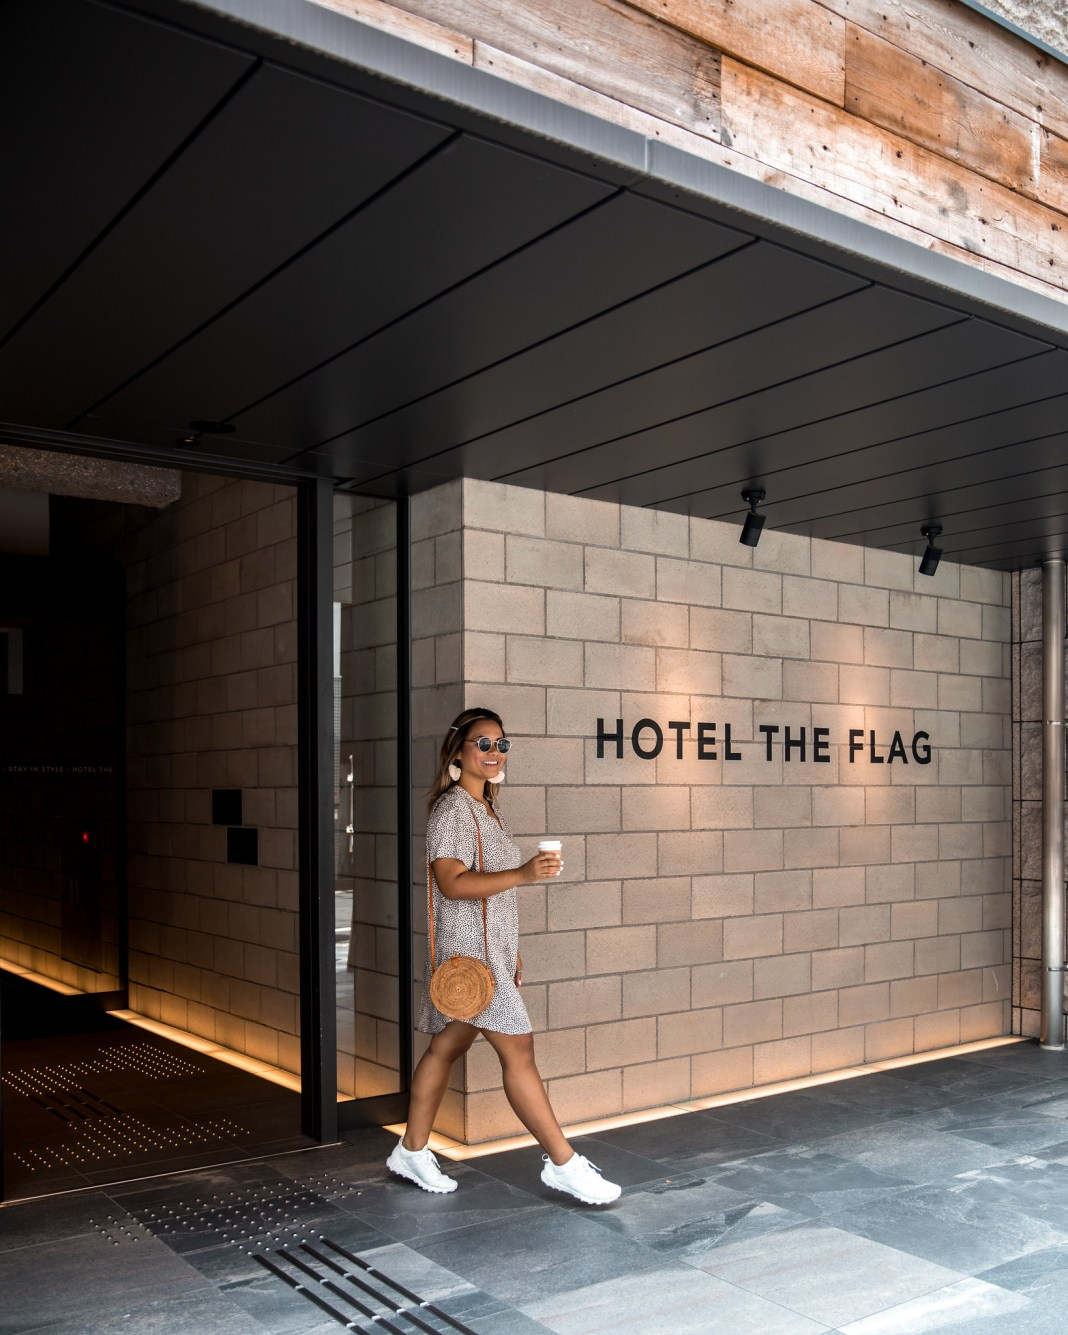 Hotel The Flag - Osaka, Japan, Dotonbori, Shinsaibashi, Osaka Travel, Traveling in Osaka, Japan Travel, Osaka Tips, Osaka Hotel, Traveling Osaka | Wanderlustyle.com